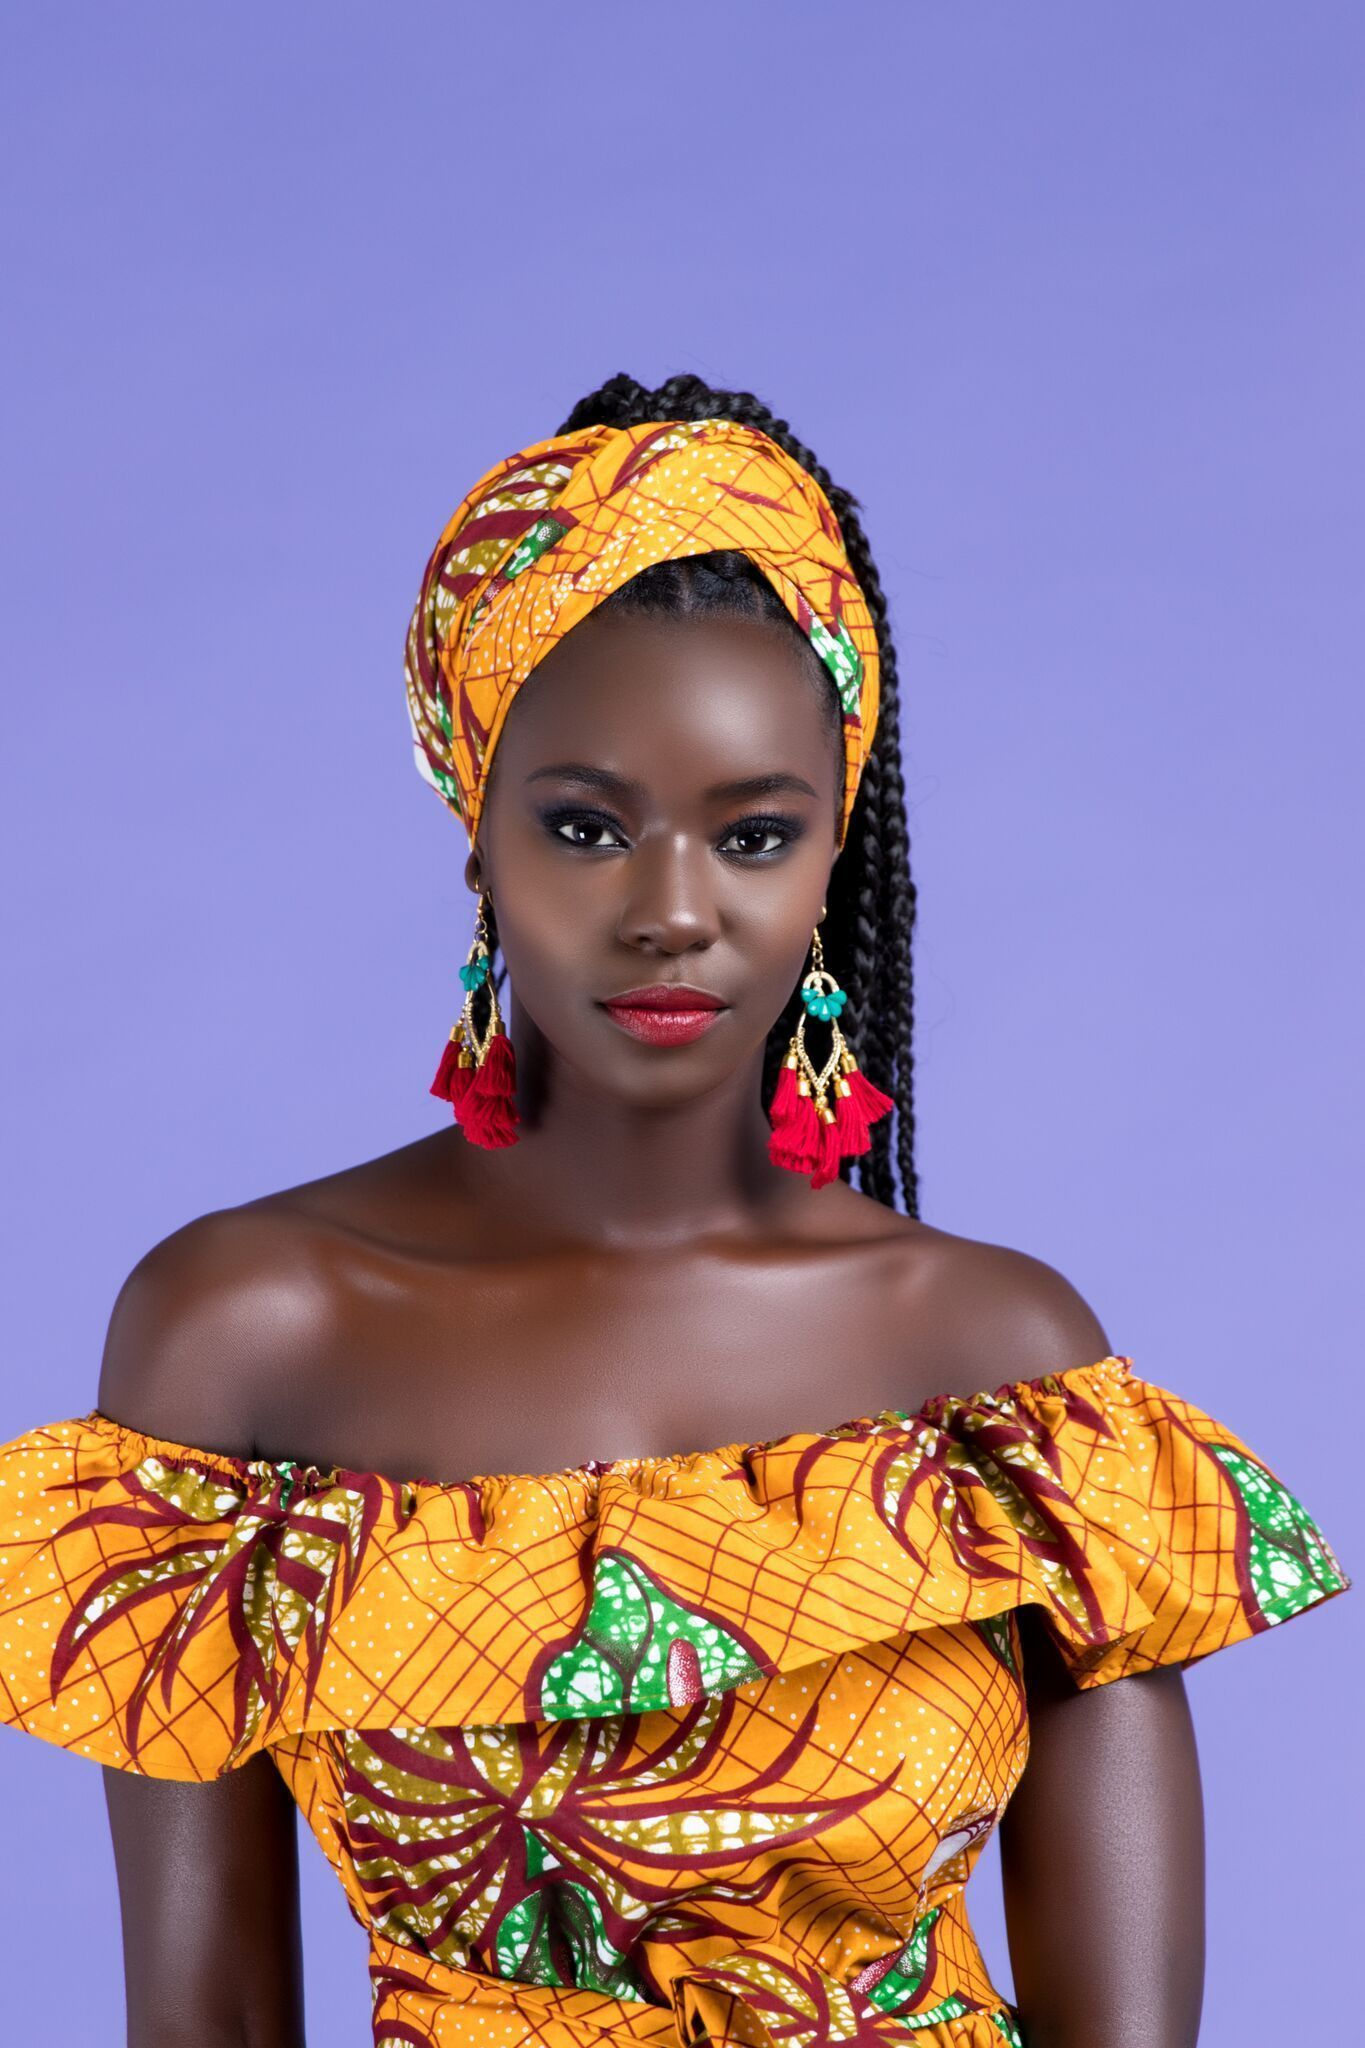 African Print Ouma Headwrap #africanbeauty